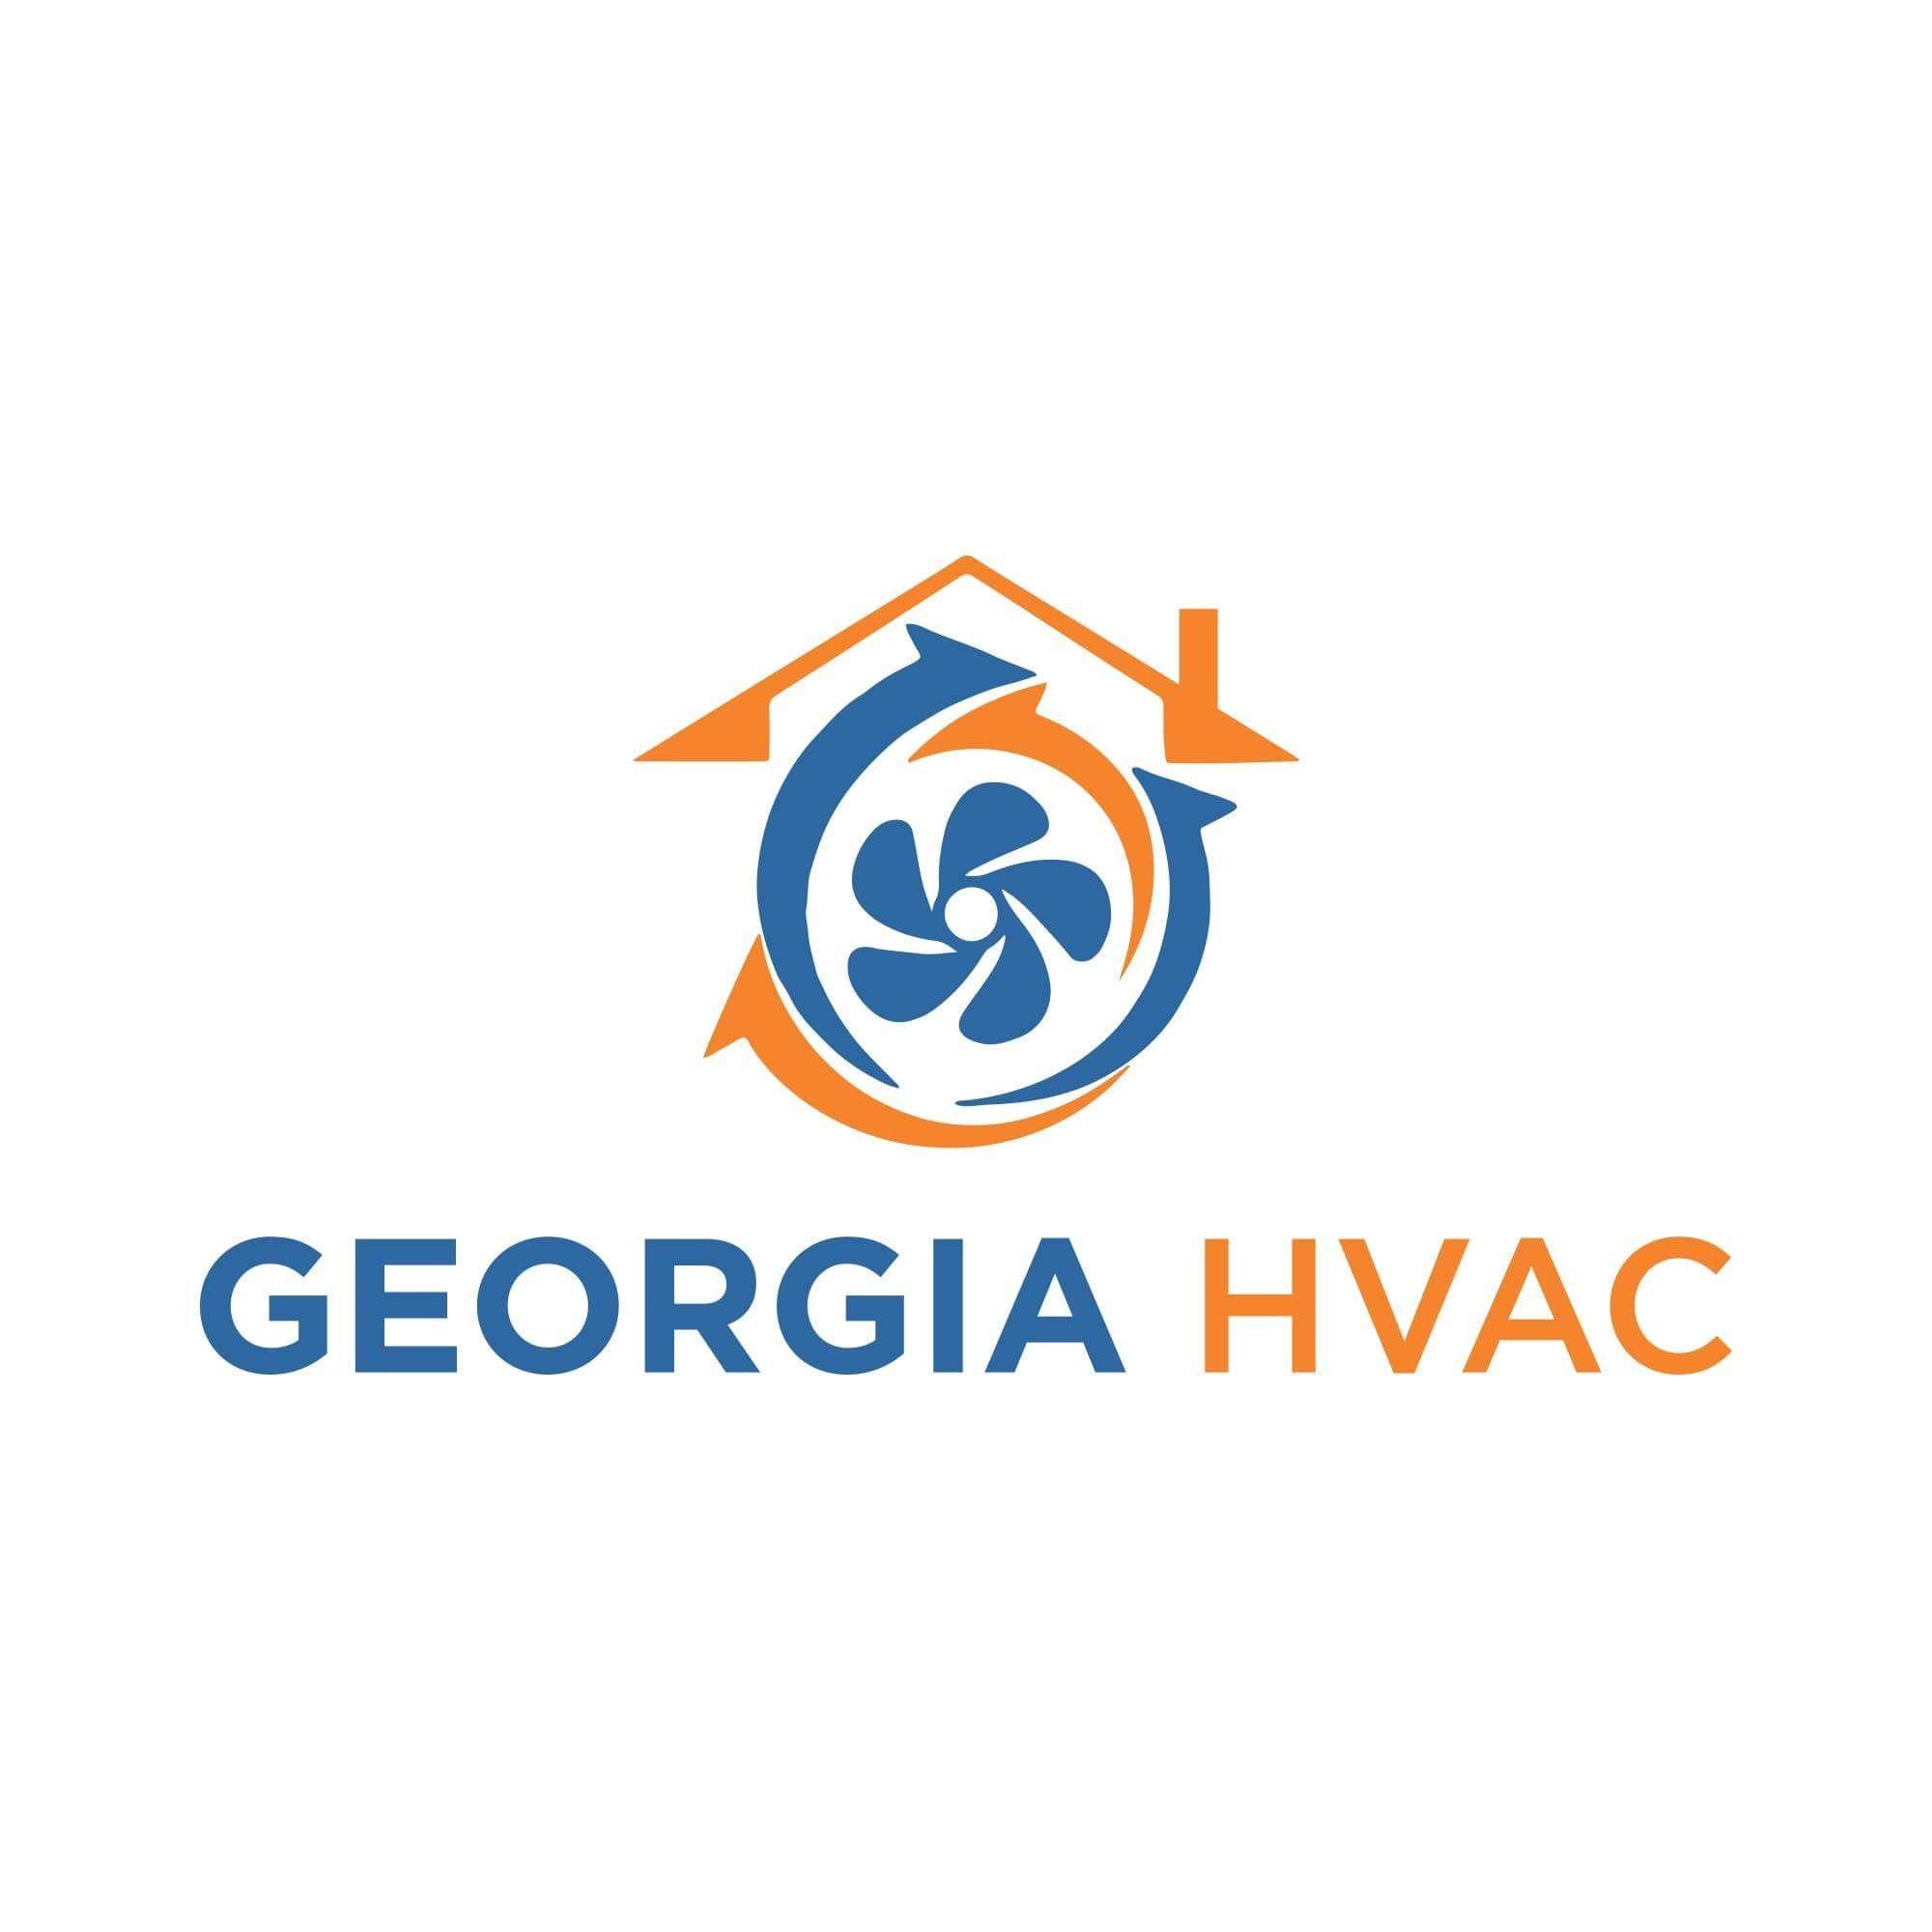 Nate Testing Http Hvac Talk Com Vbb Showthread Php 2191644 Nate